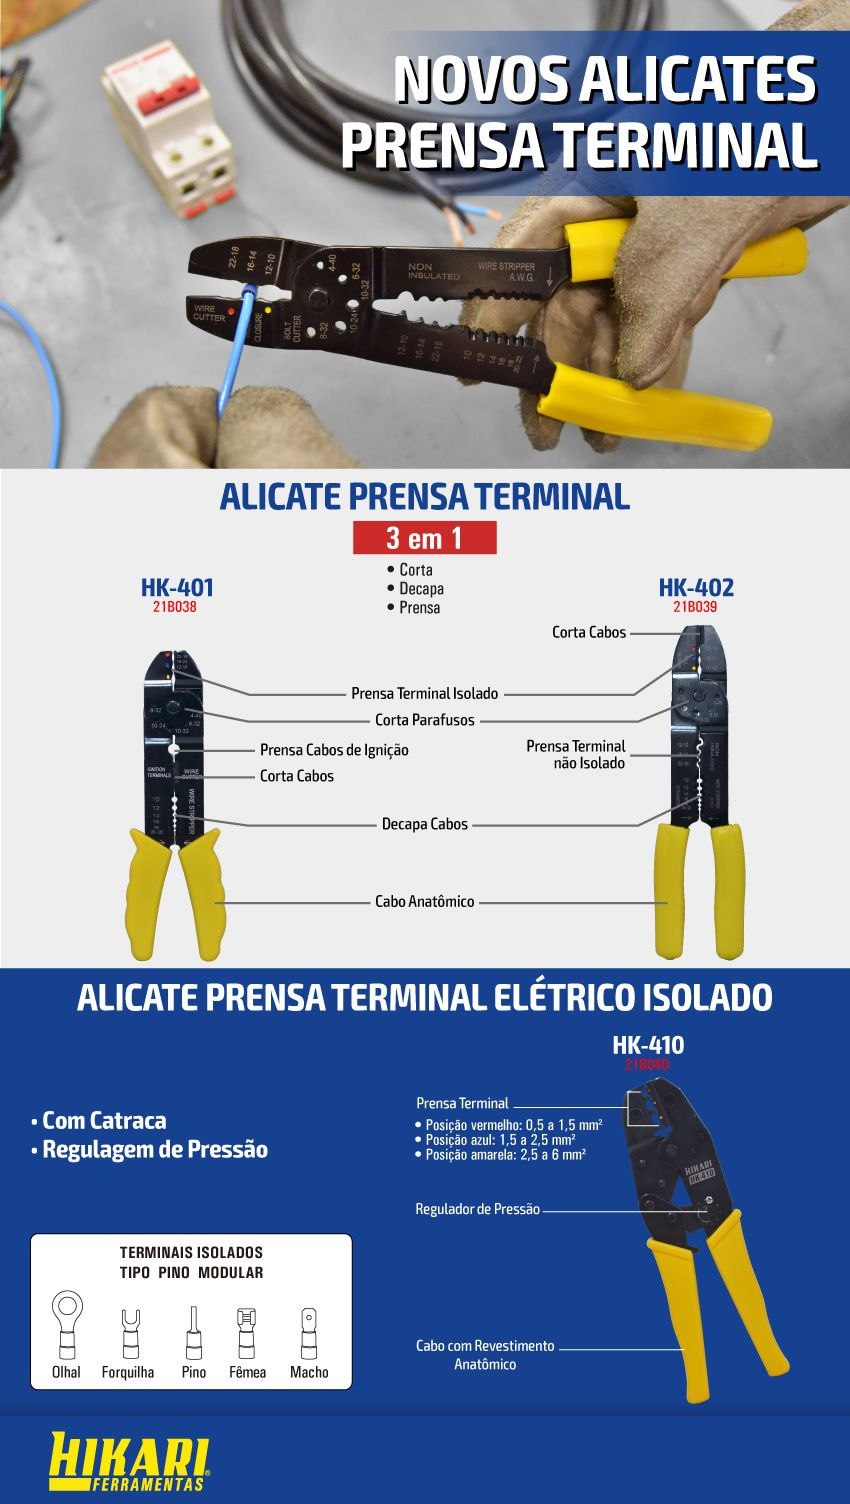 Alicate Prensa Terminal Hikari HK-401  - MRE Ferramentas